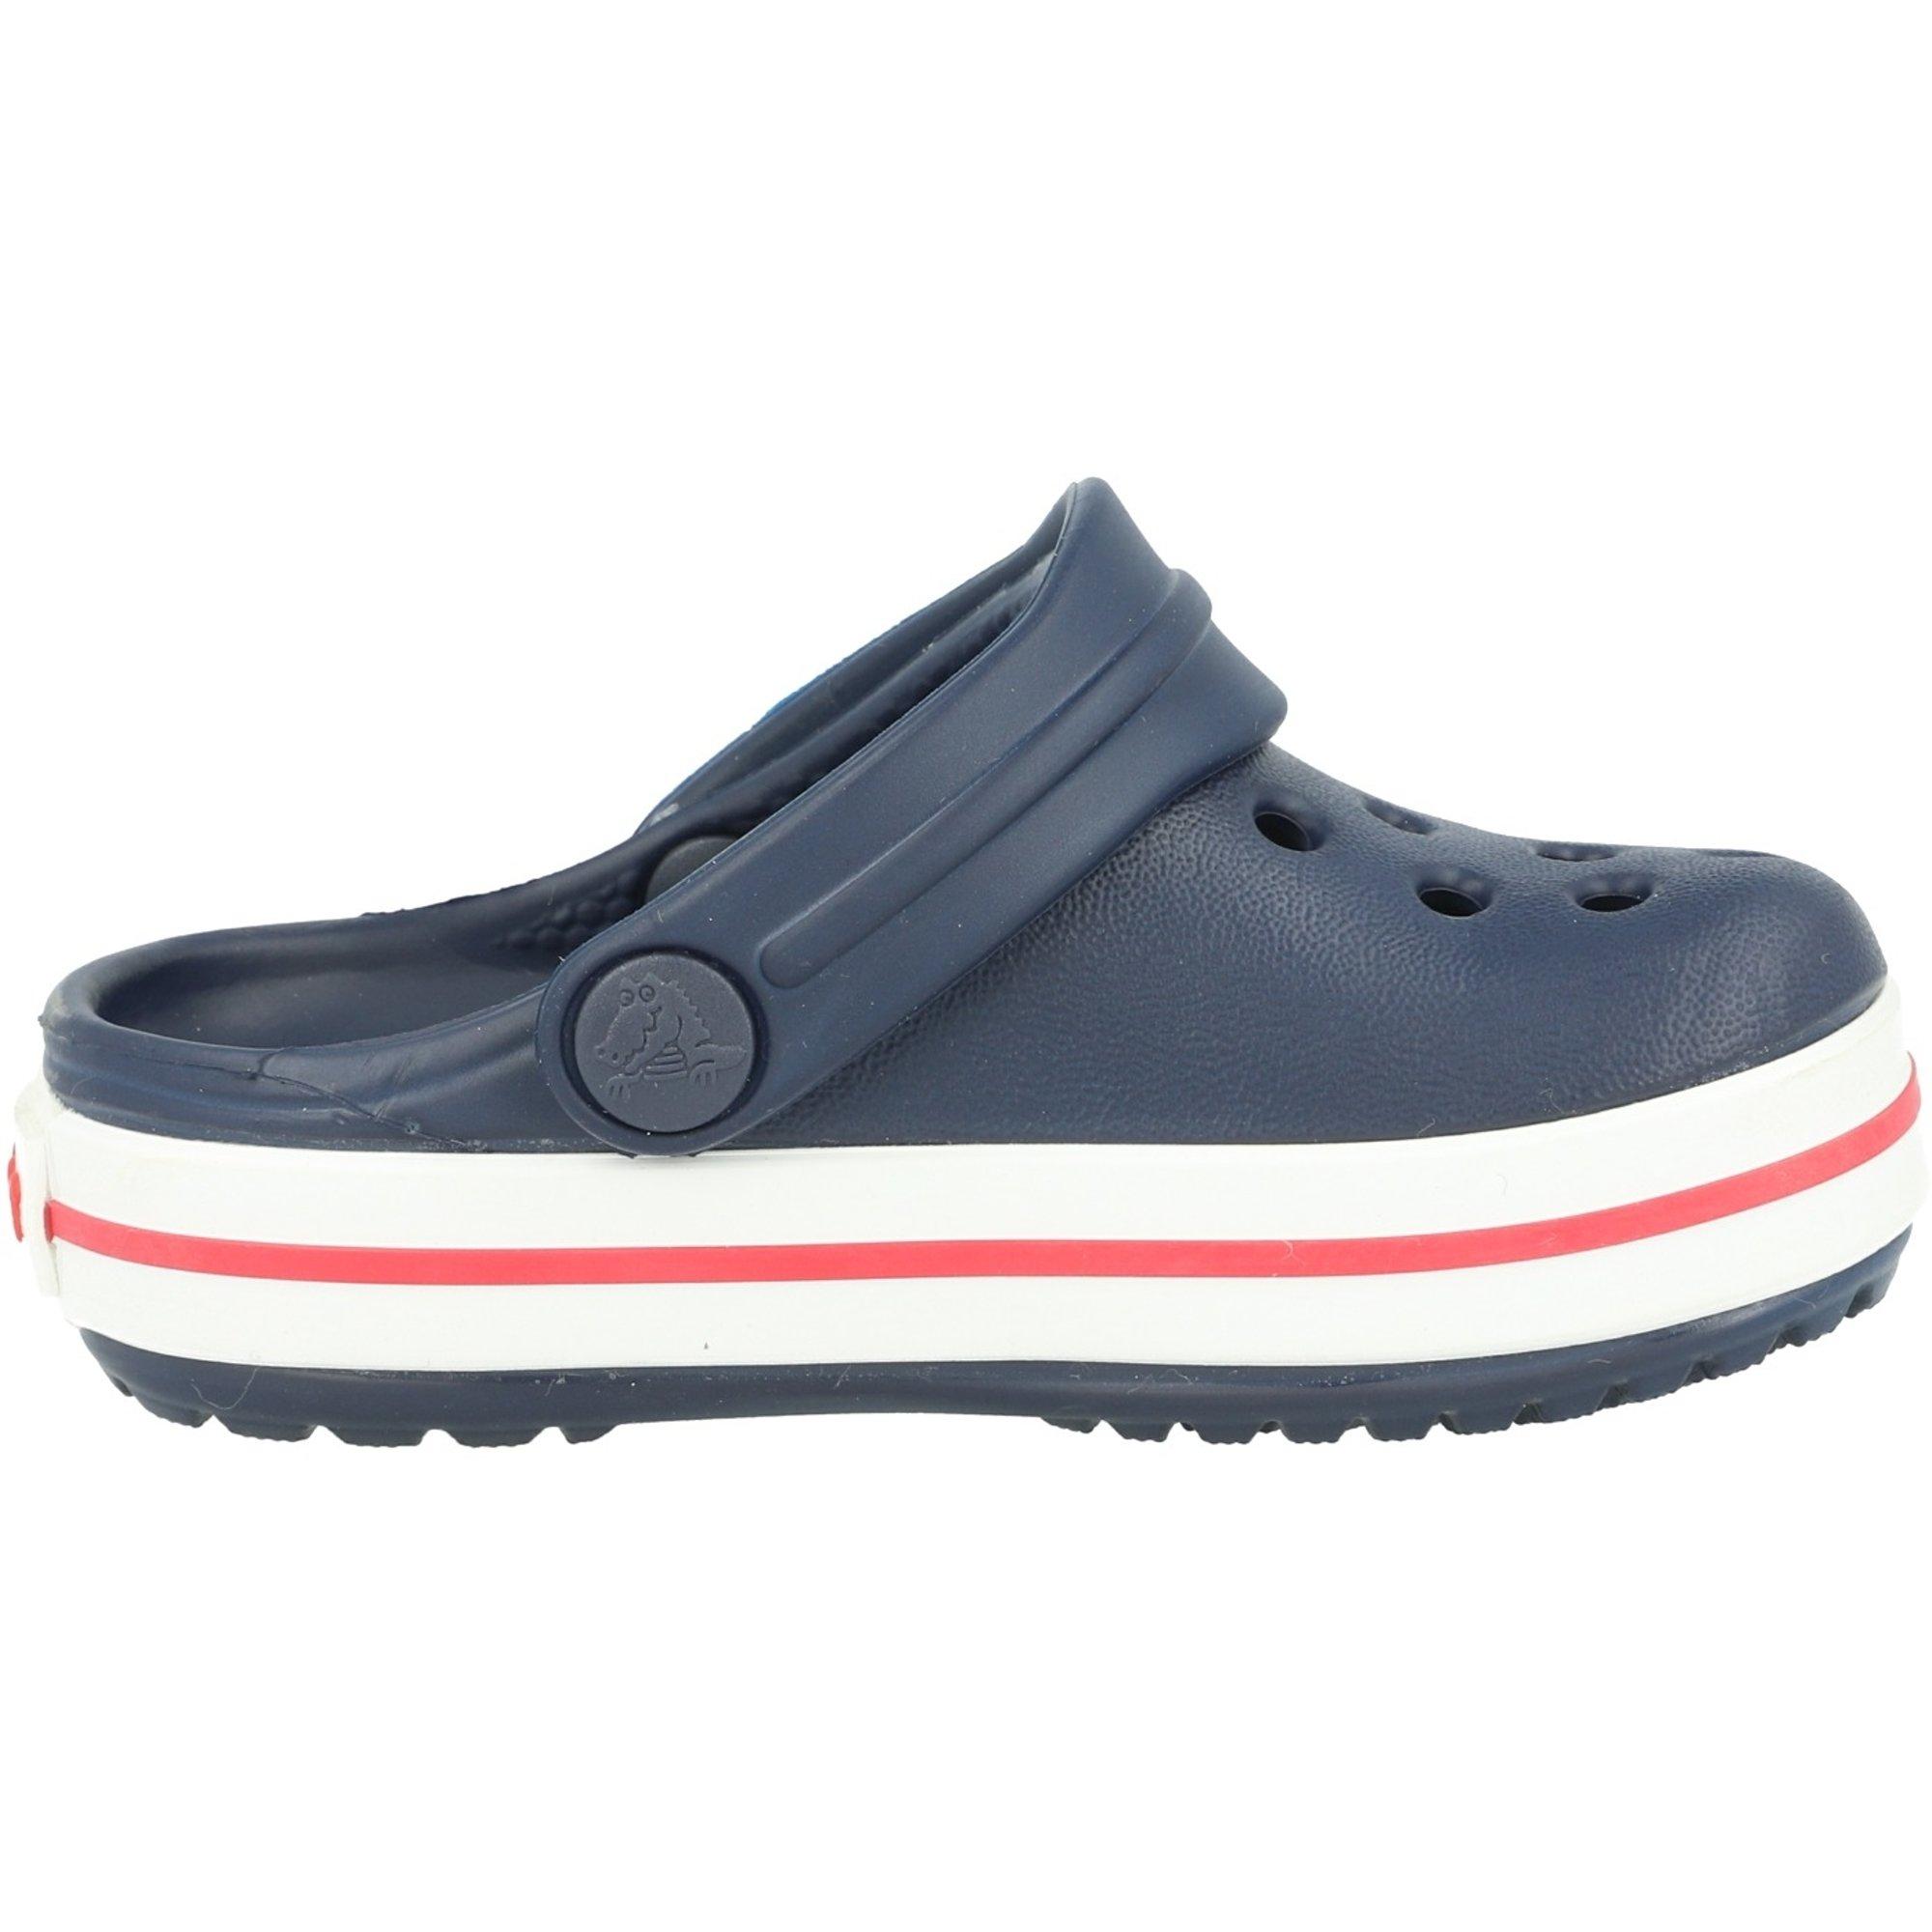 Crocs Kids Crocband Clog Navy Croslite